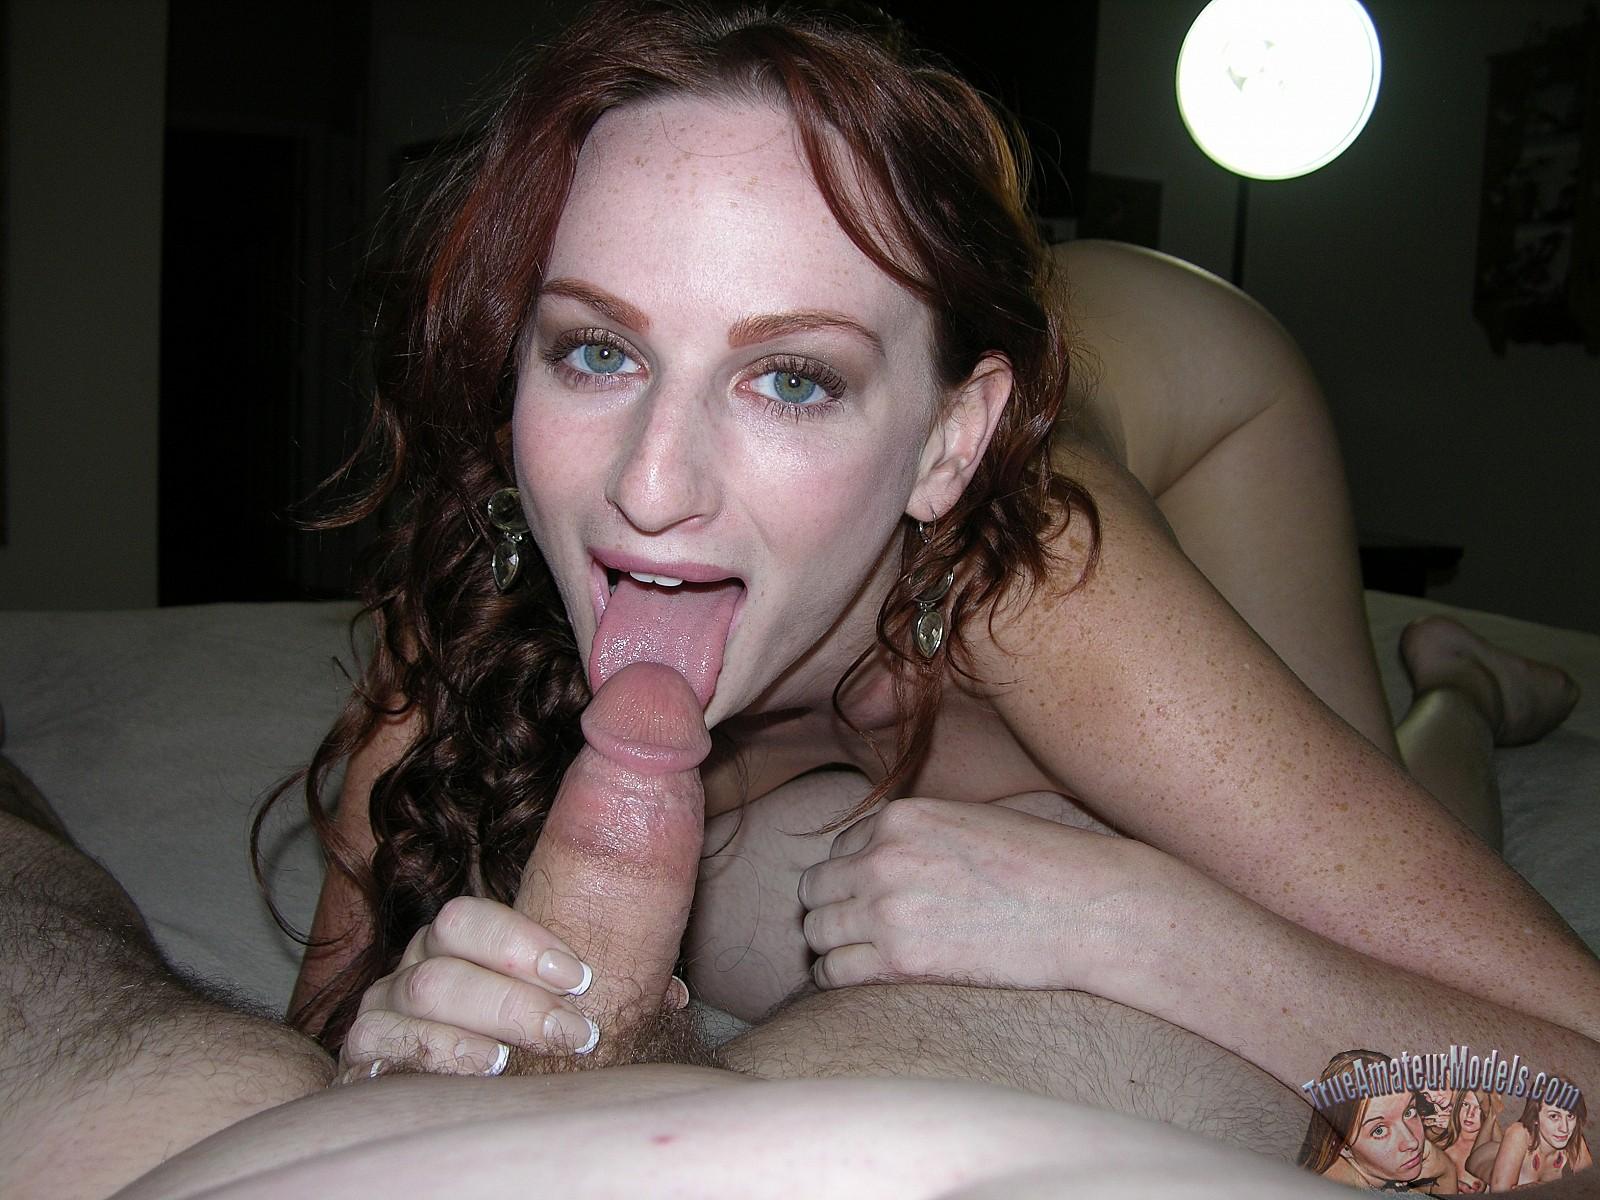 Homemade sex tape